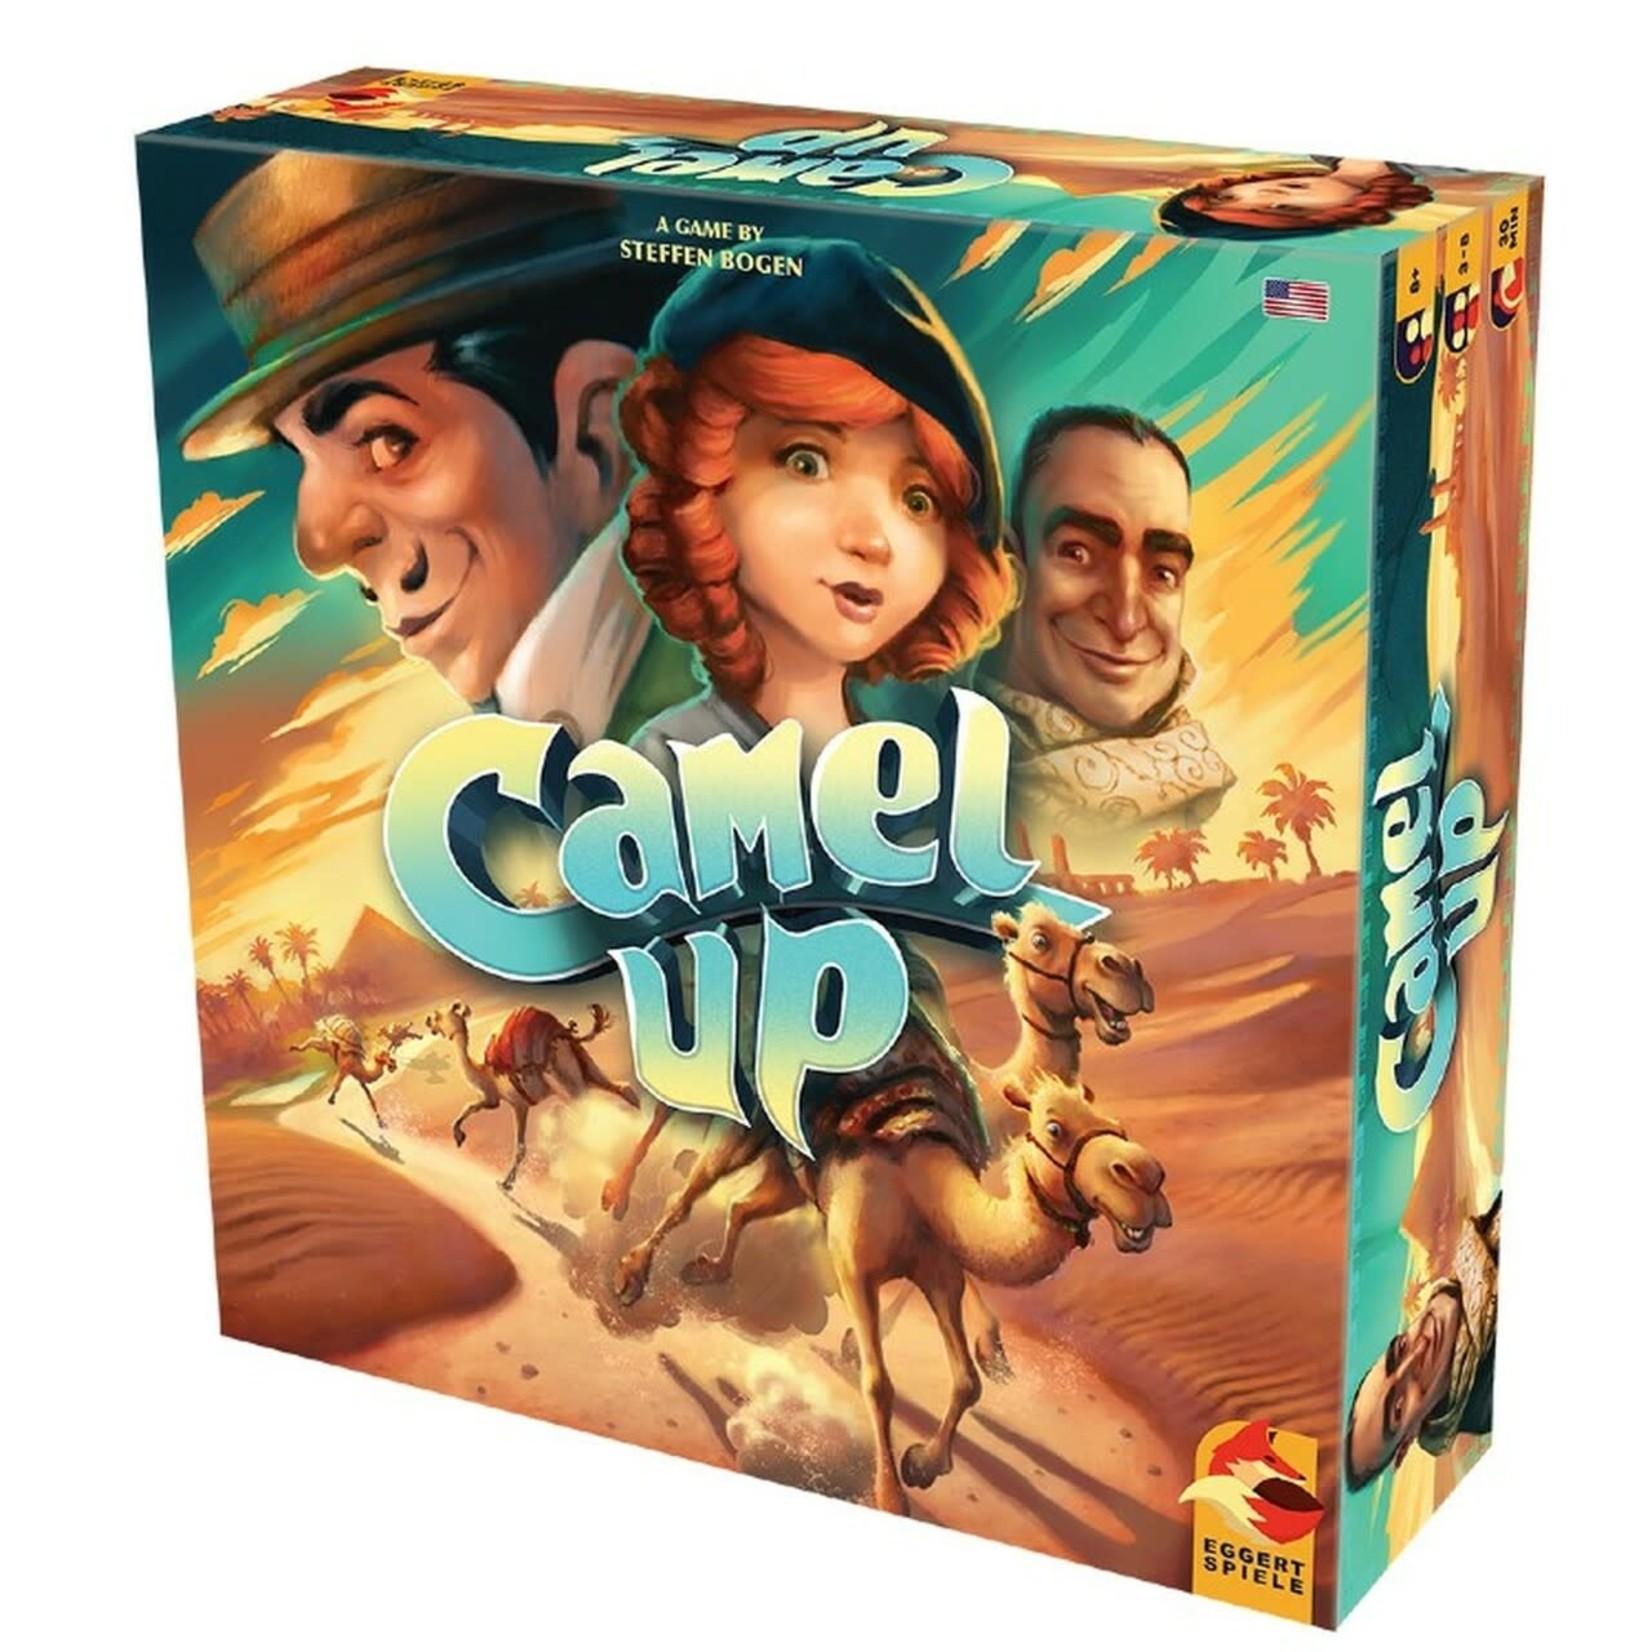 Pretzel Games Camel Up 2.0 (Preorder)